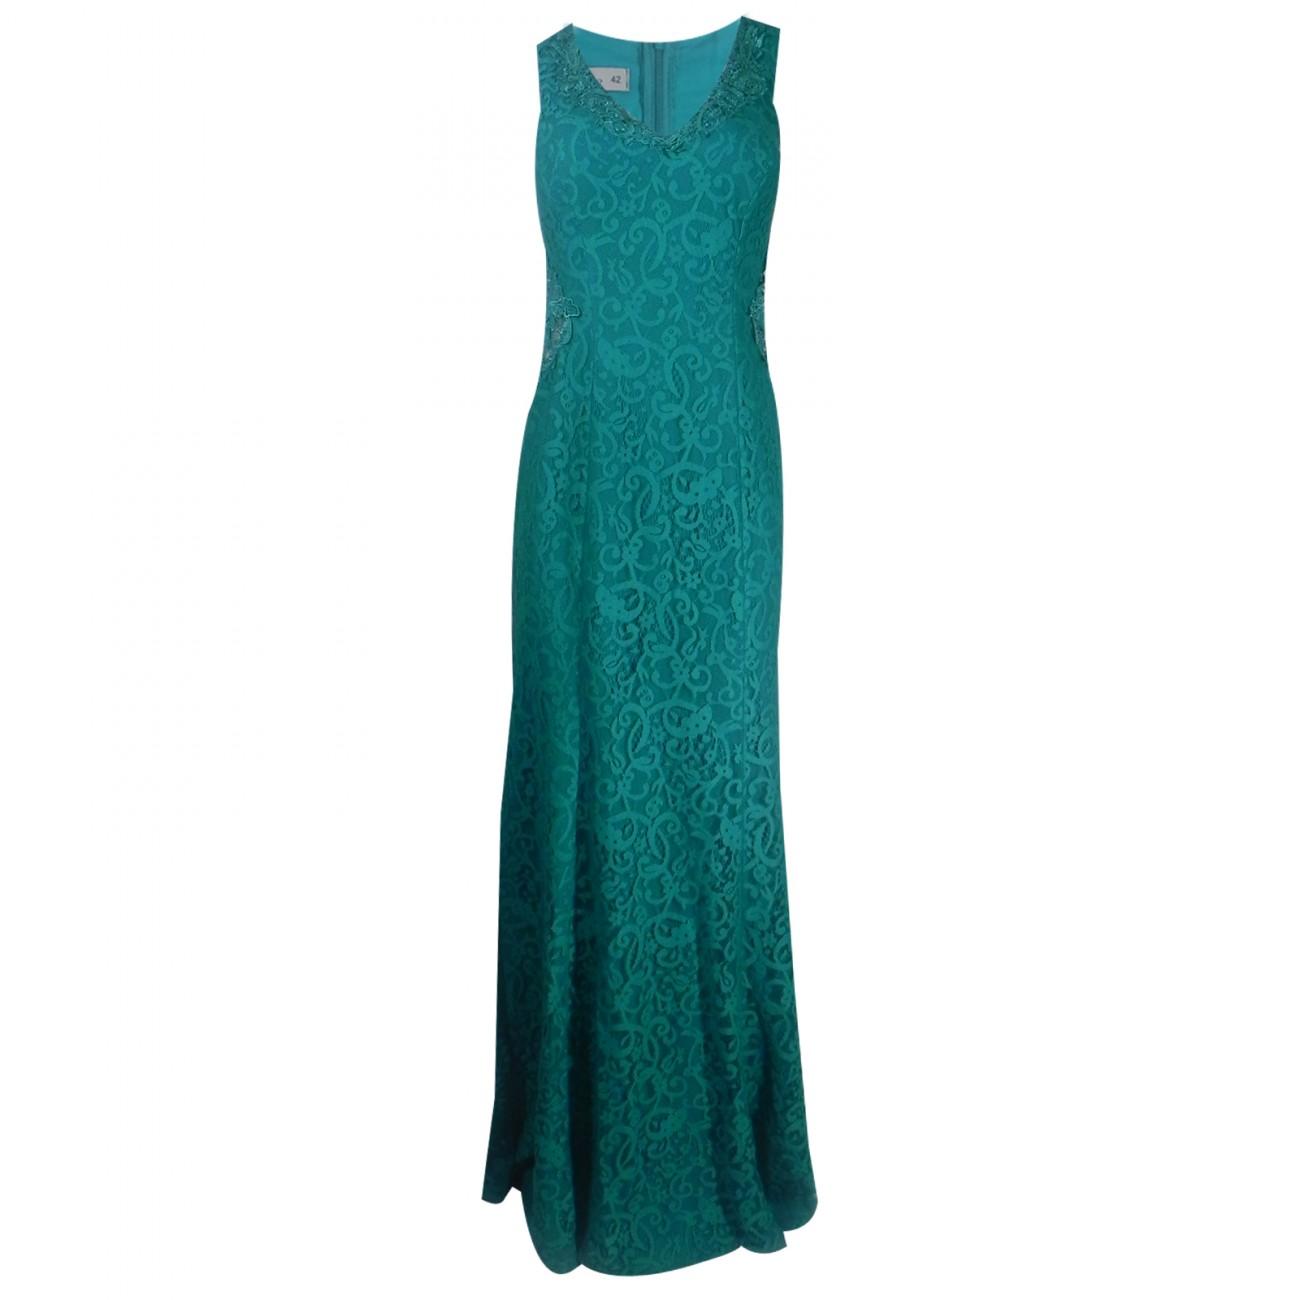 b37e301b24 Vestido Longo de Renda Verde e Tule Ilusion em Guipir - Pole Modas